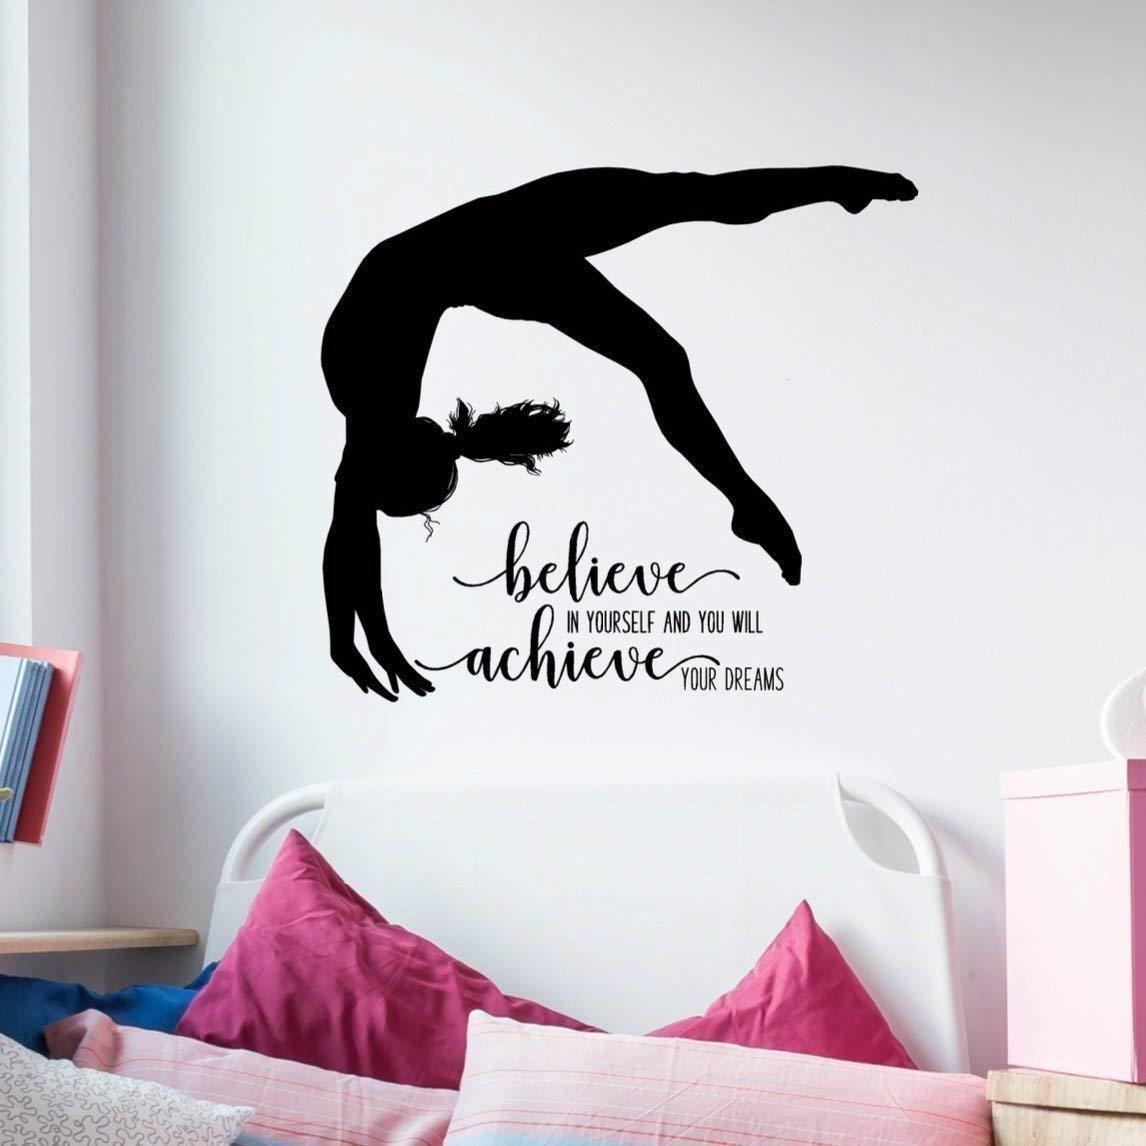 Gymnastics Quote Wall Decal, Dance Studio Decor, Gymnast Vinyl Sticker, 36''X32'' Black, Gymnast Gift